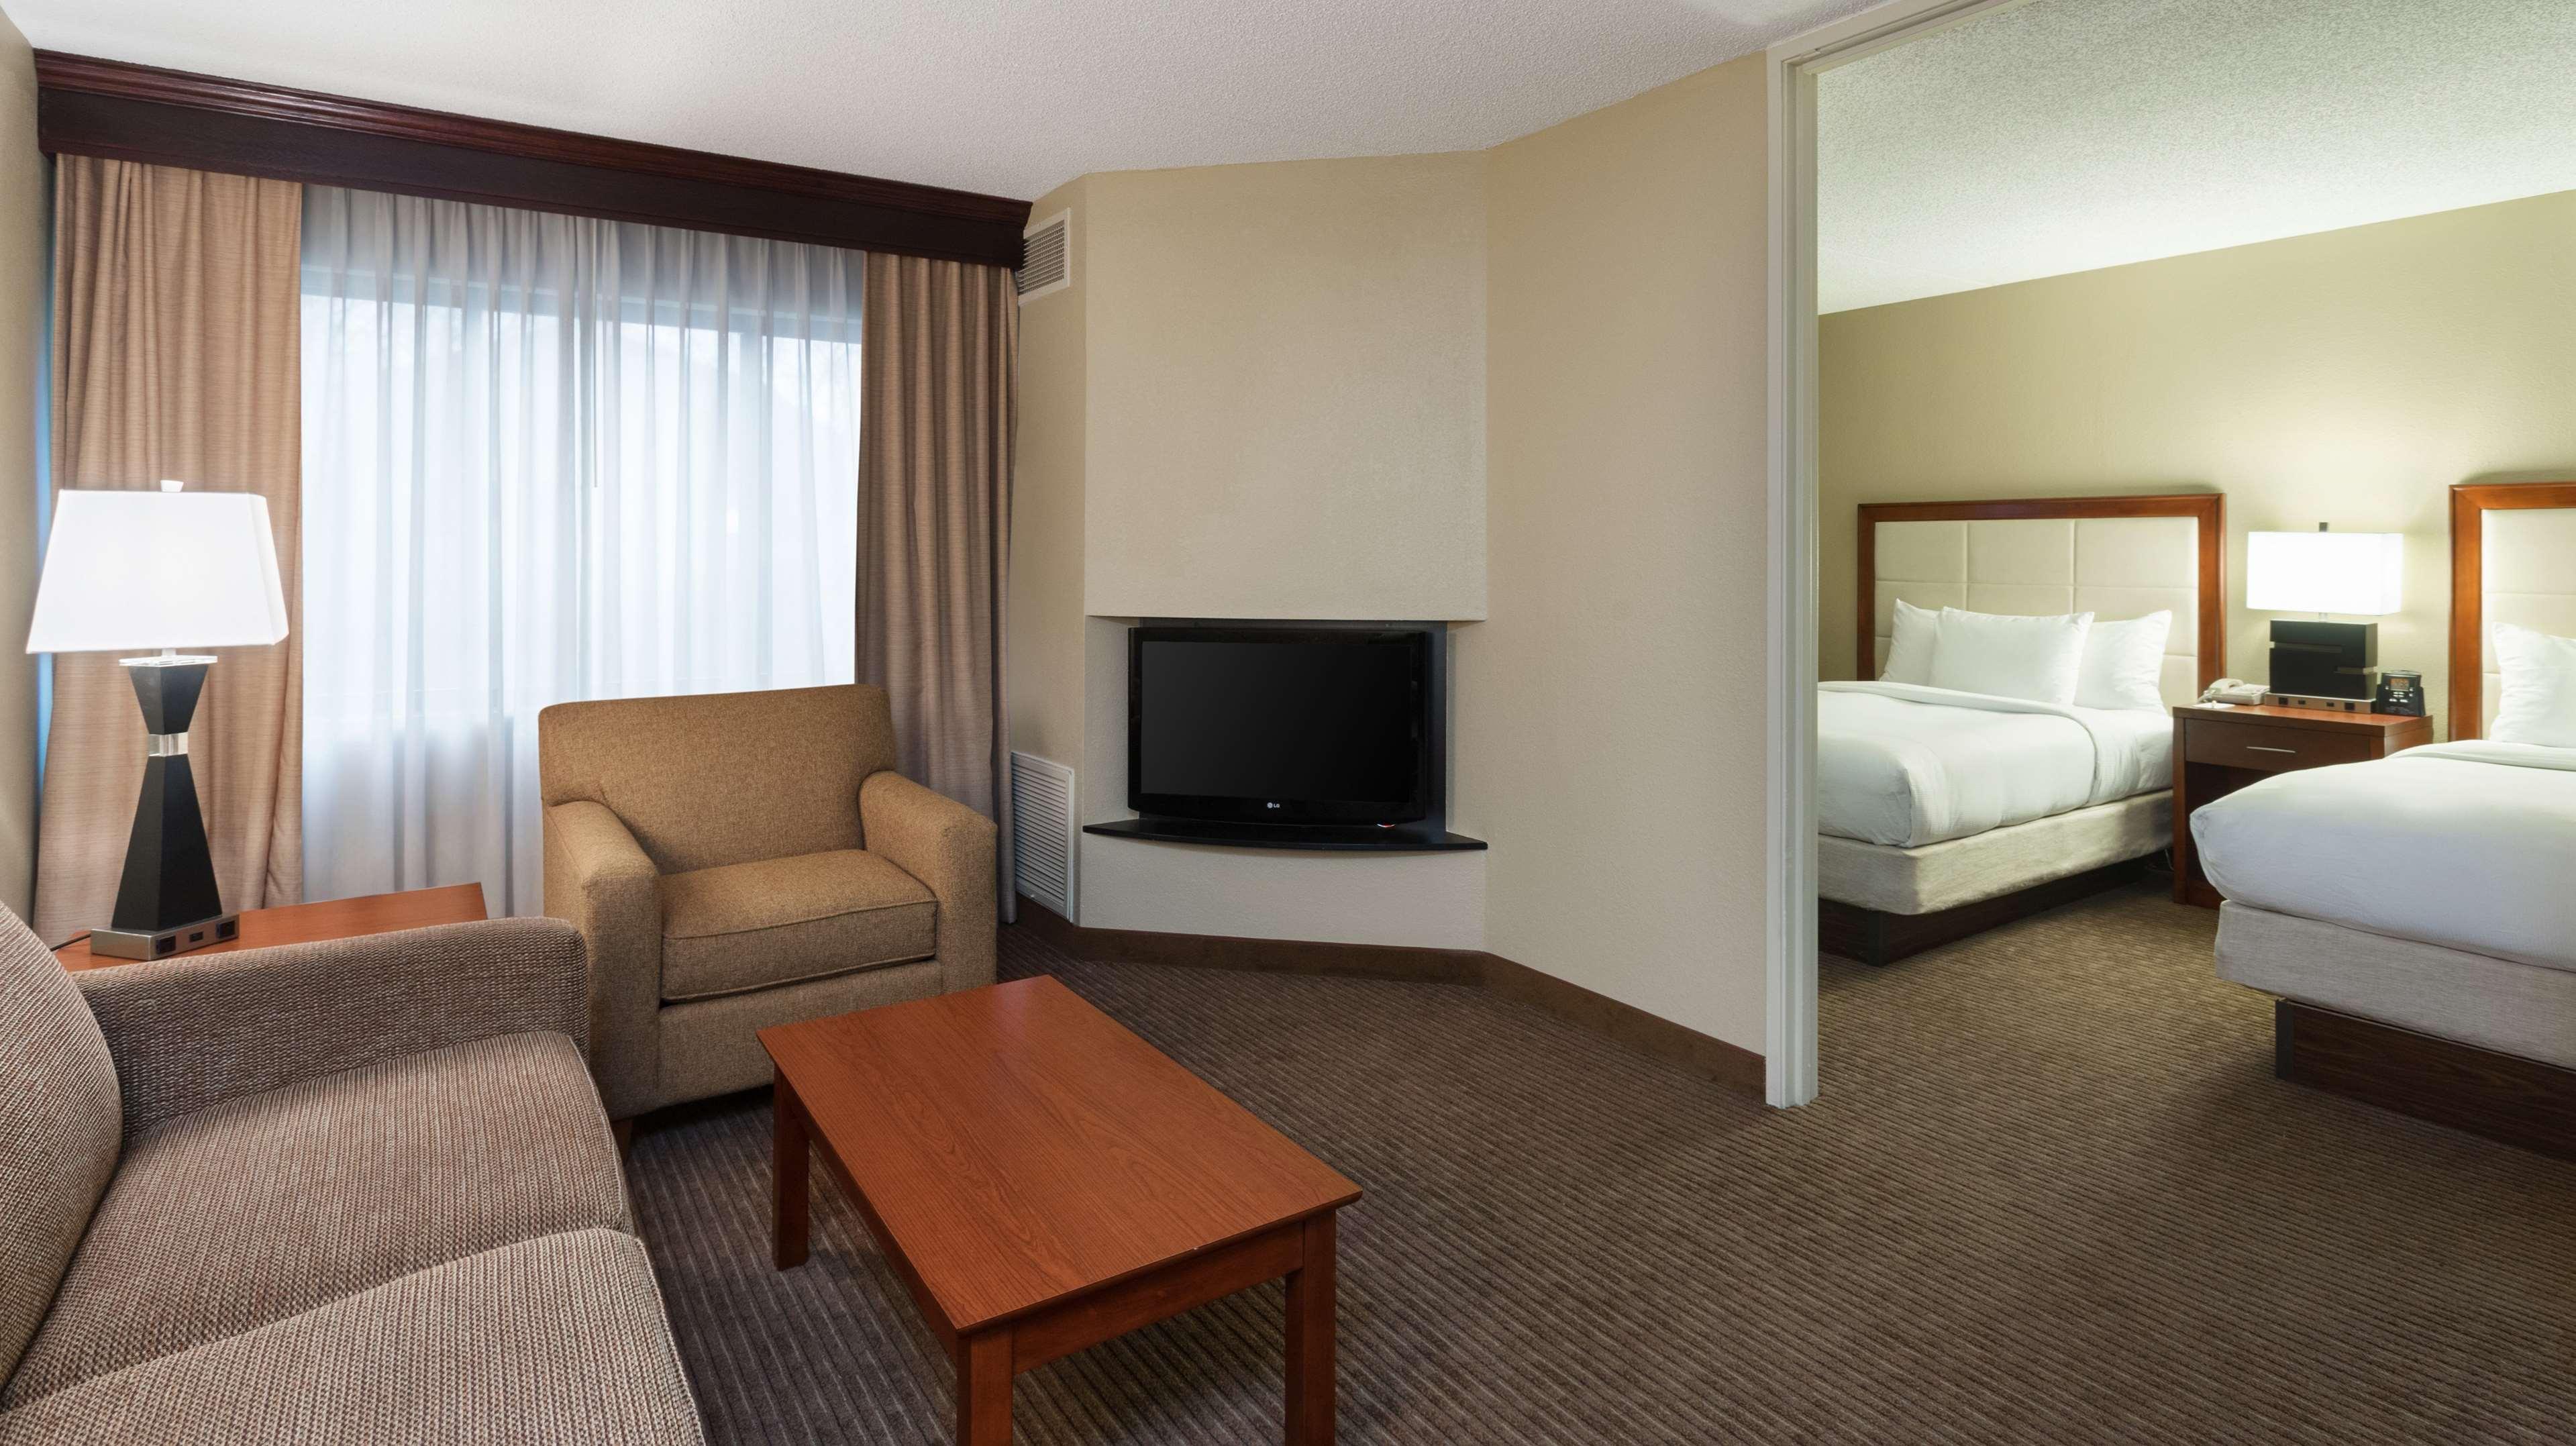 DoubleTree Suites by Hilton Hotel Cincinnati - Blue Ash image 28